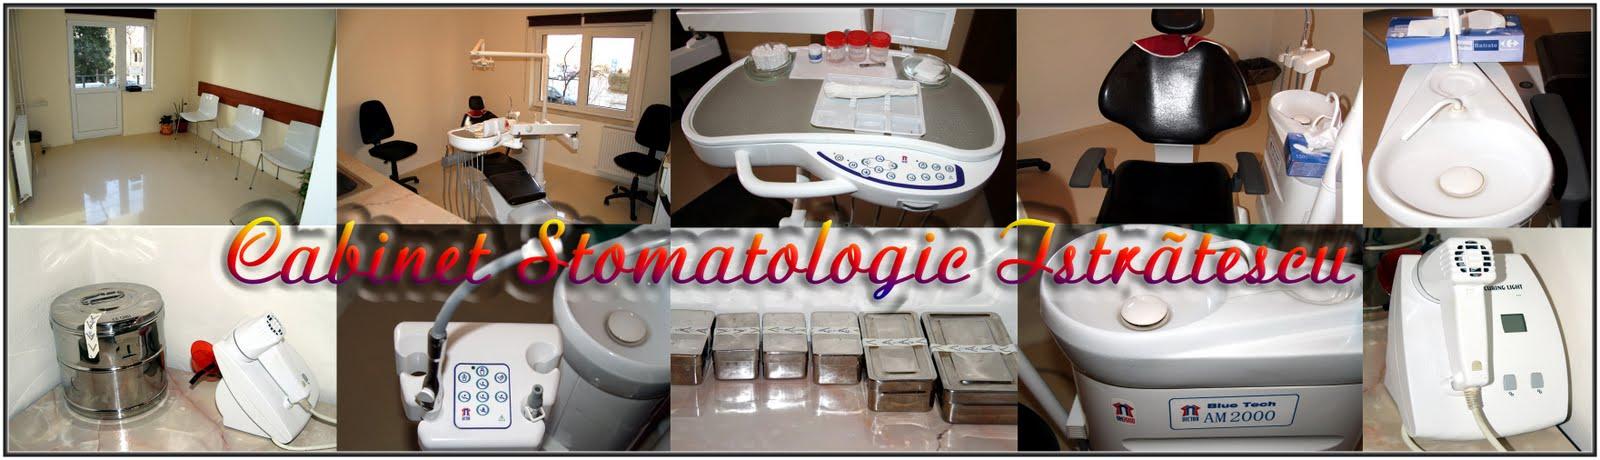 Cabinet Stomatologic Istratescu